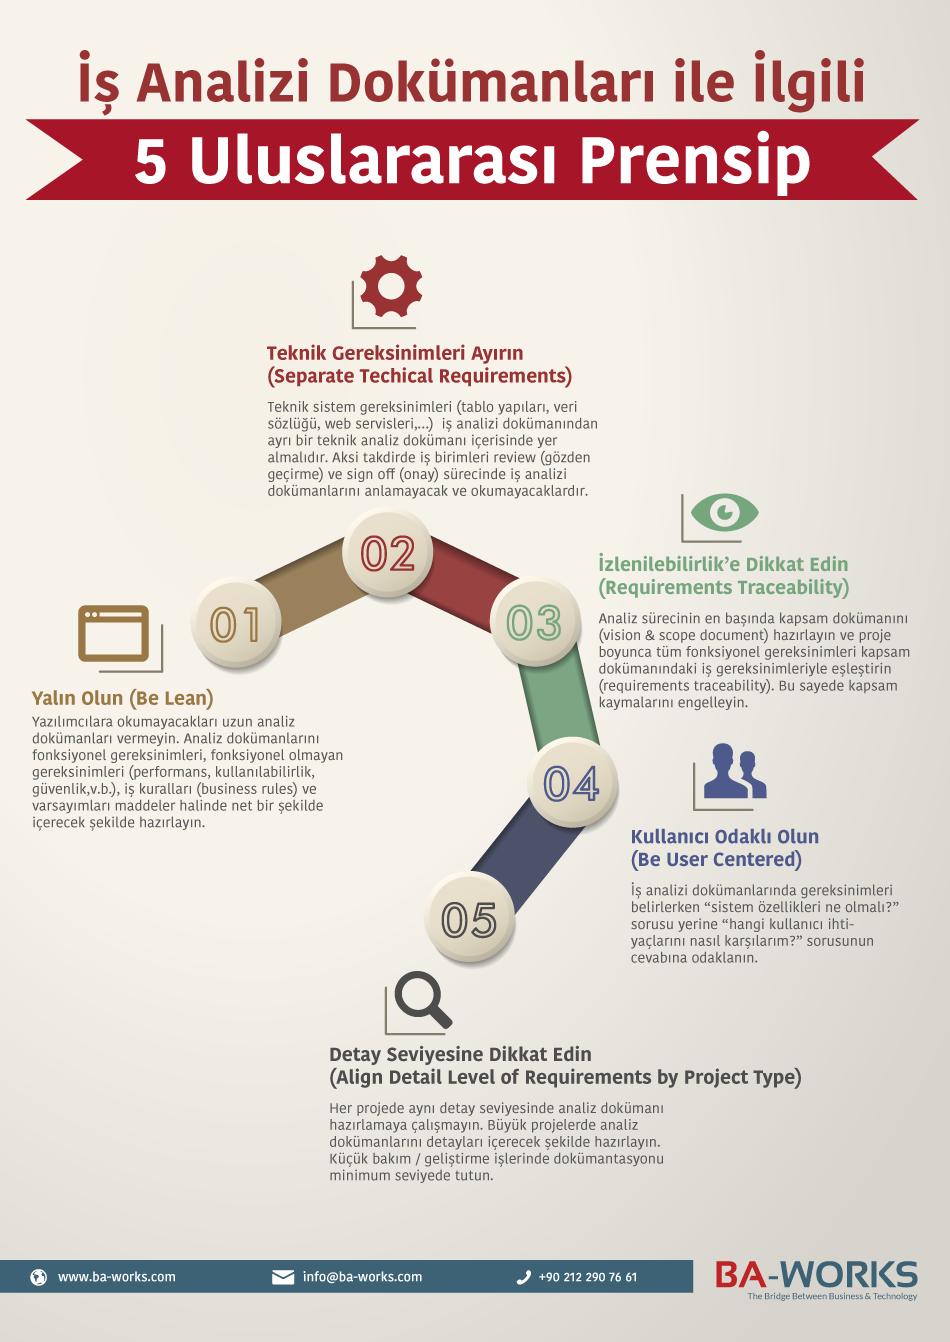 is-analizi-dokumanlari-infografik